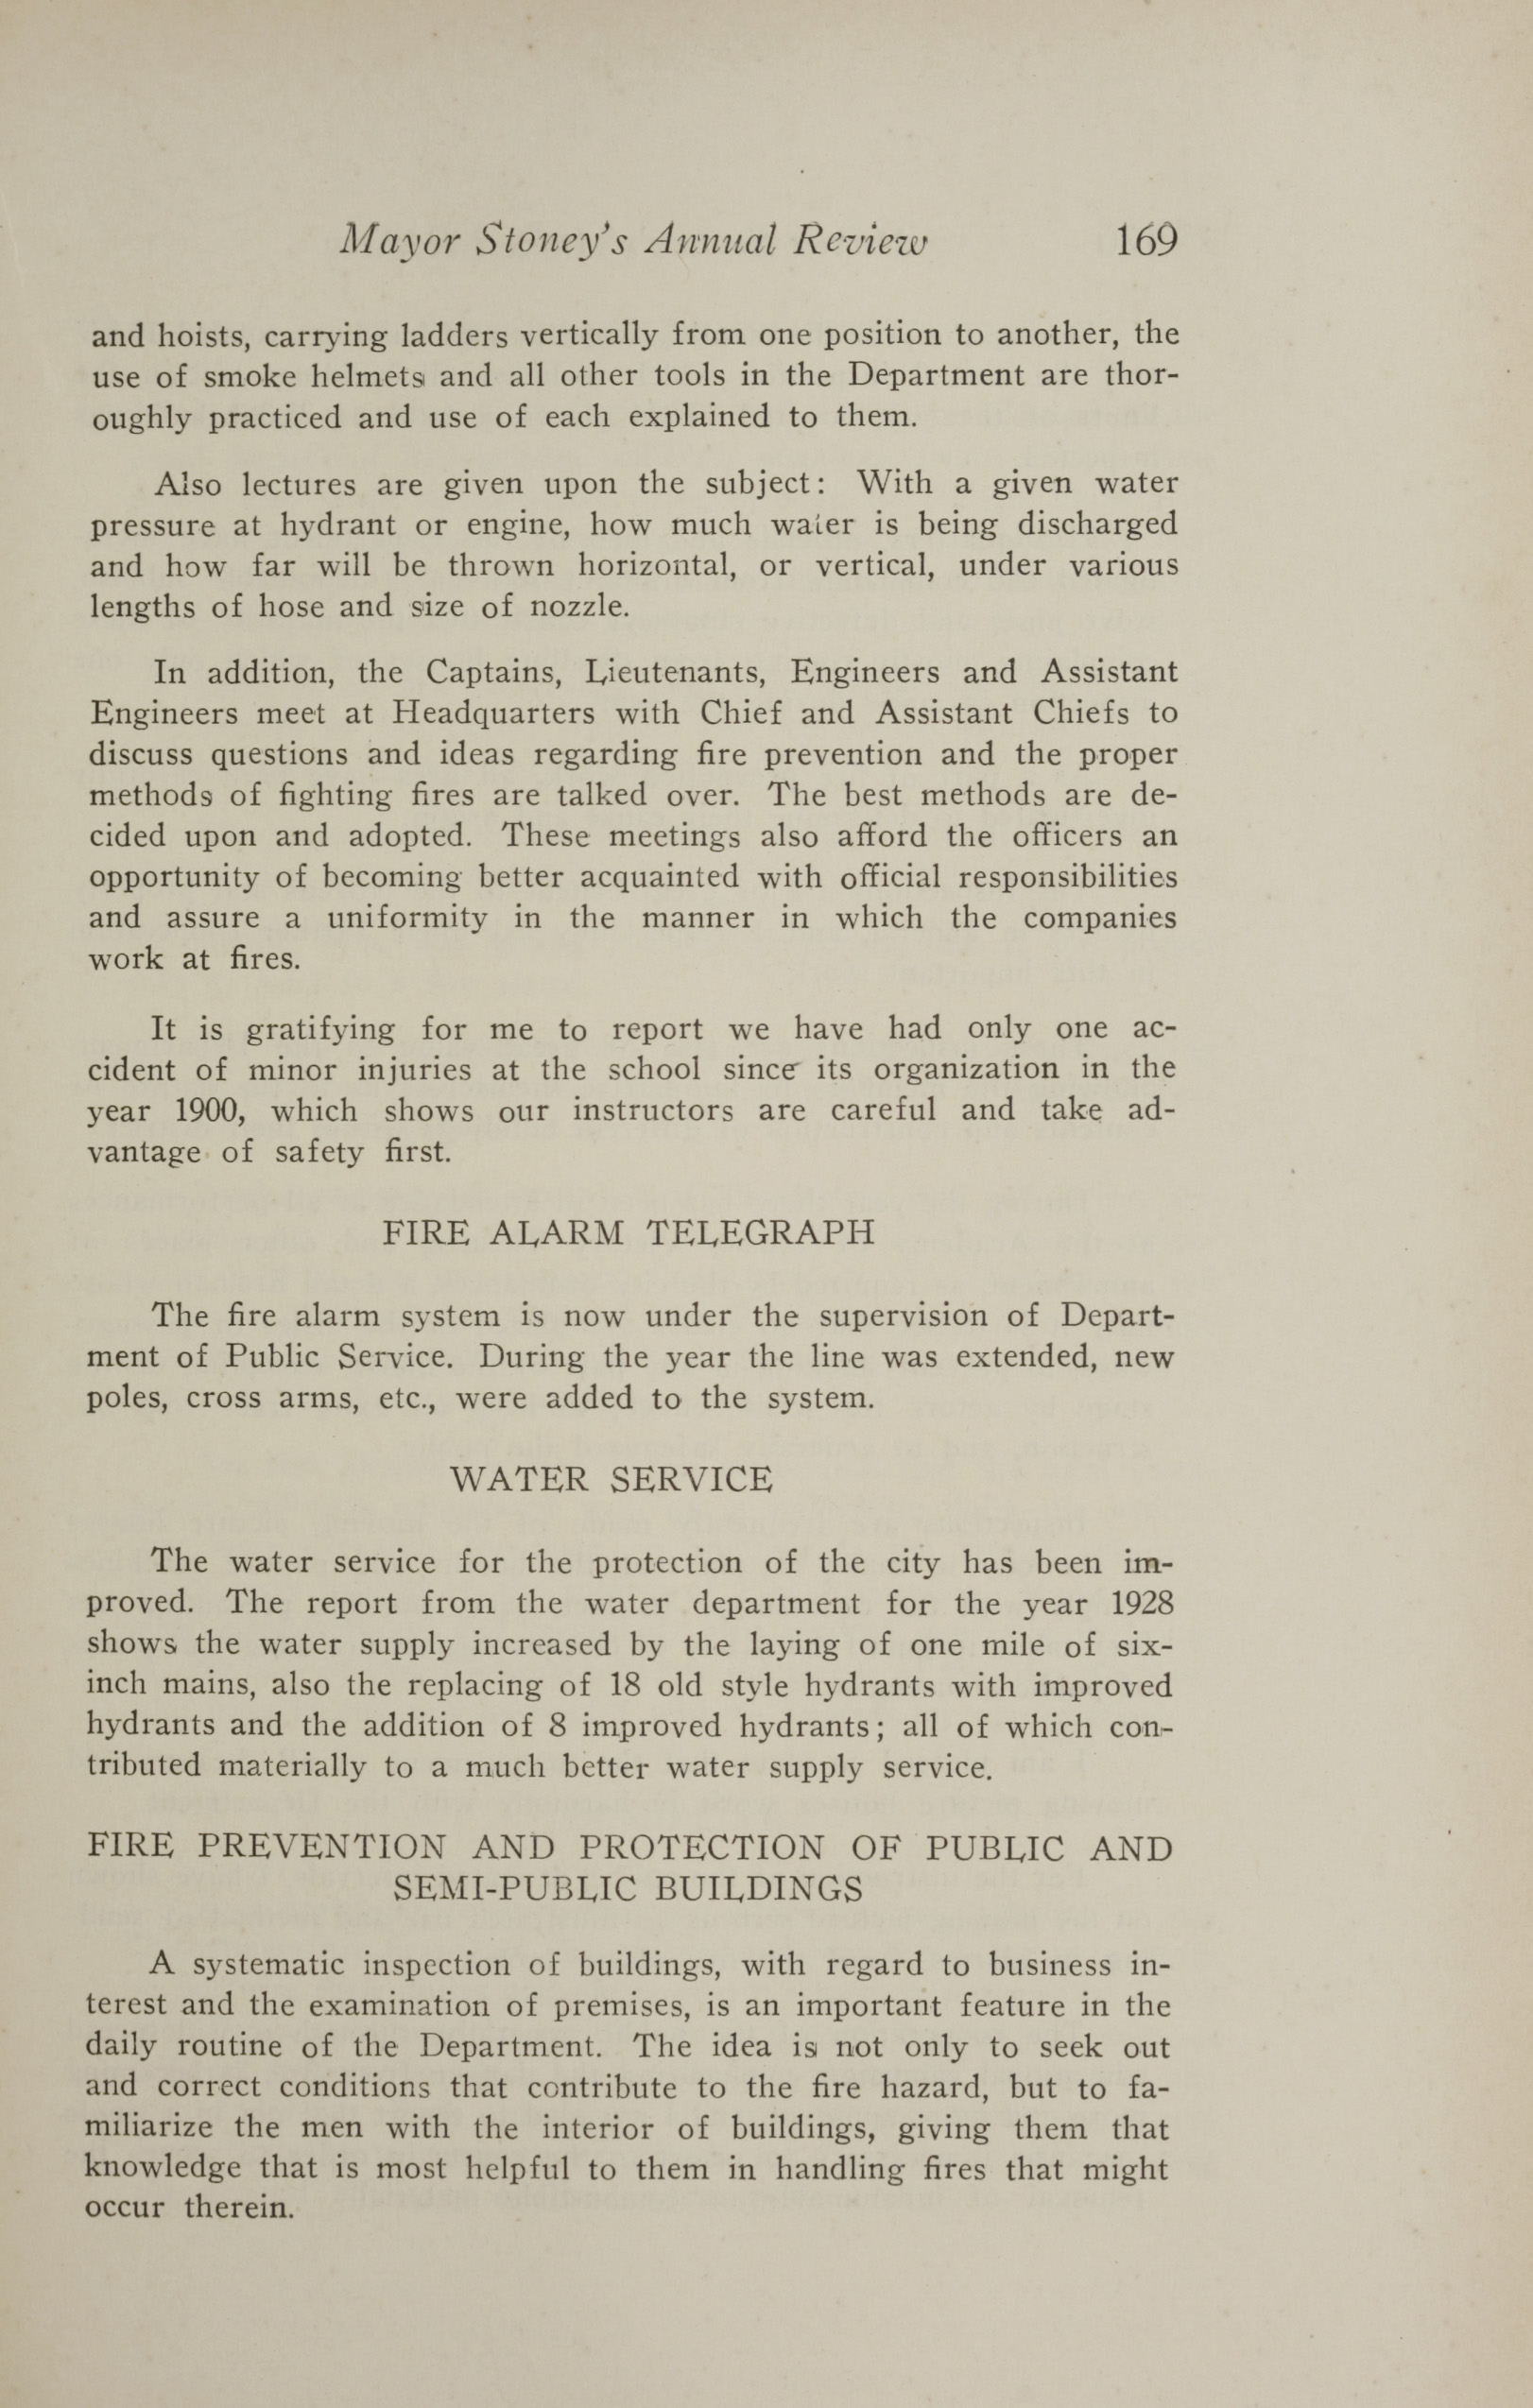 Charleston Yearbook, 1928, page 169